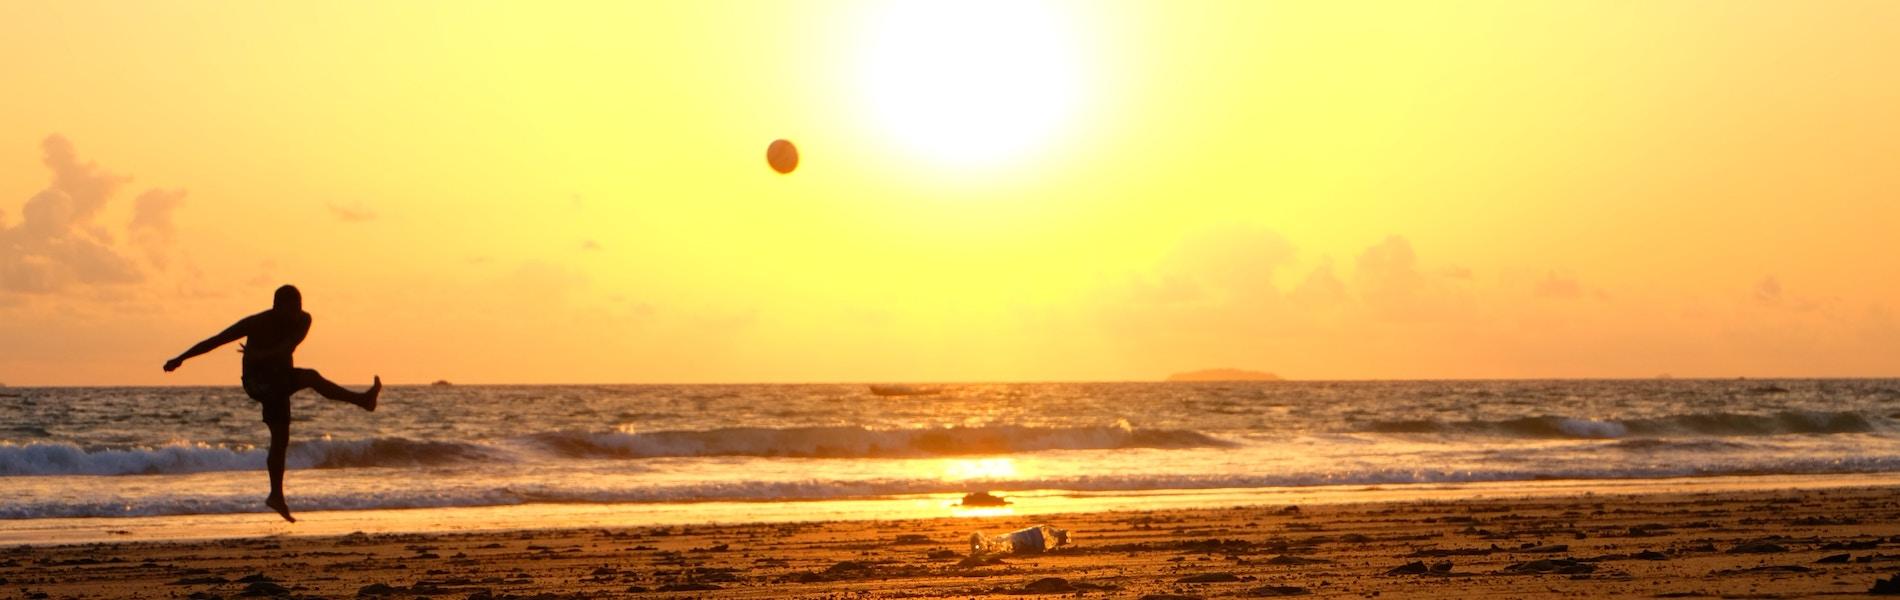 Beach football